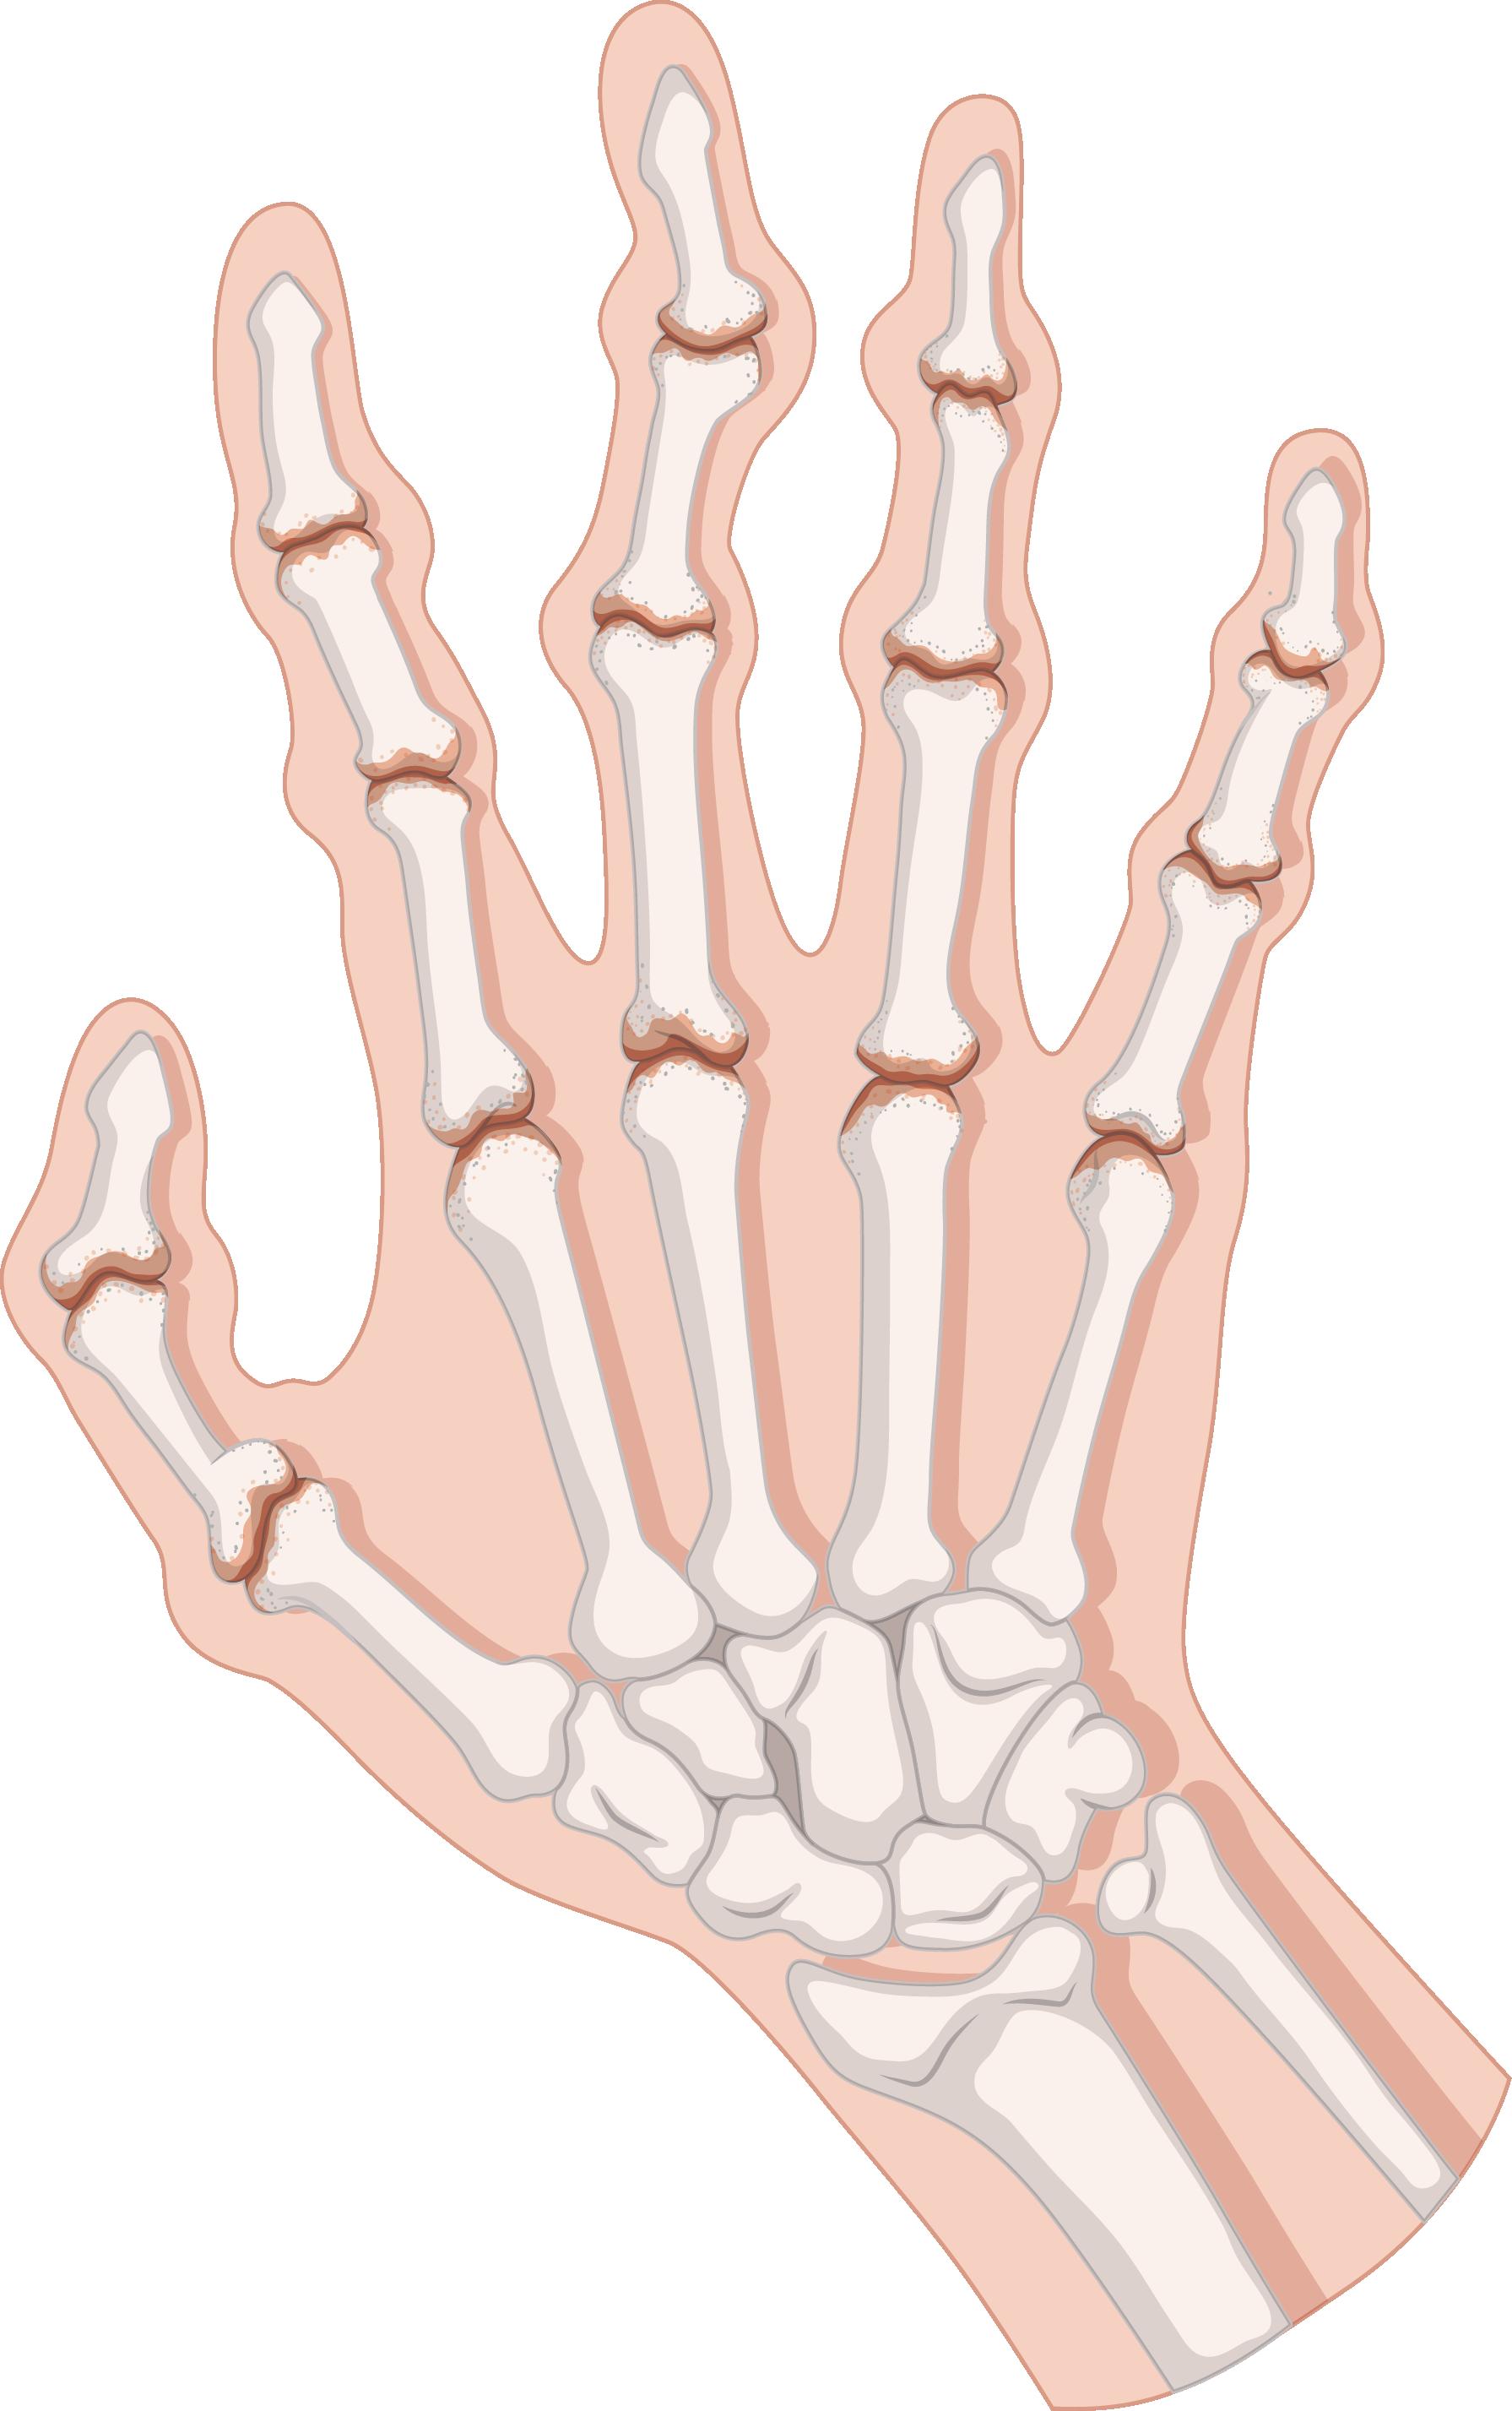 Skeleton clipart body part. Rheumatoid arthritis clip art